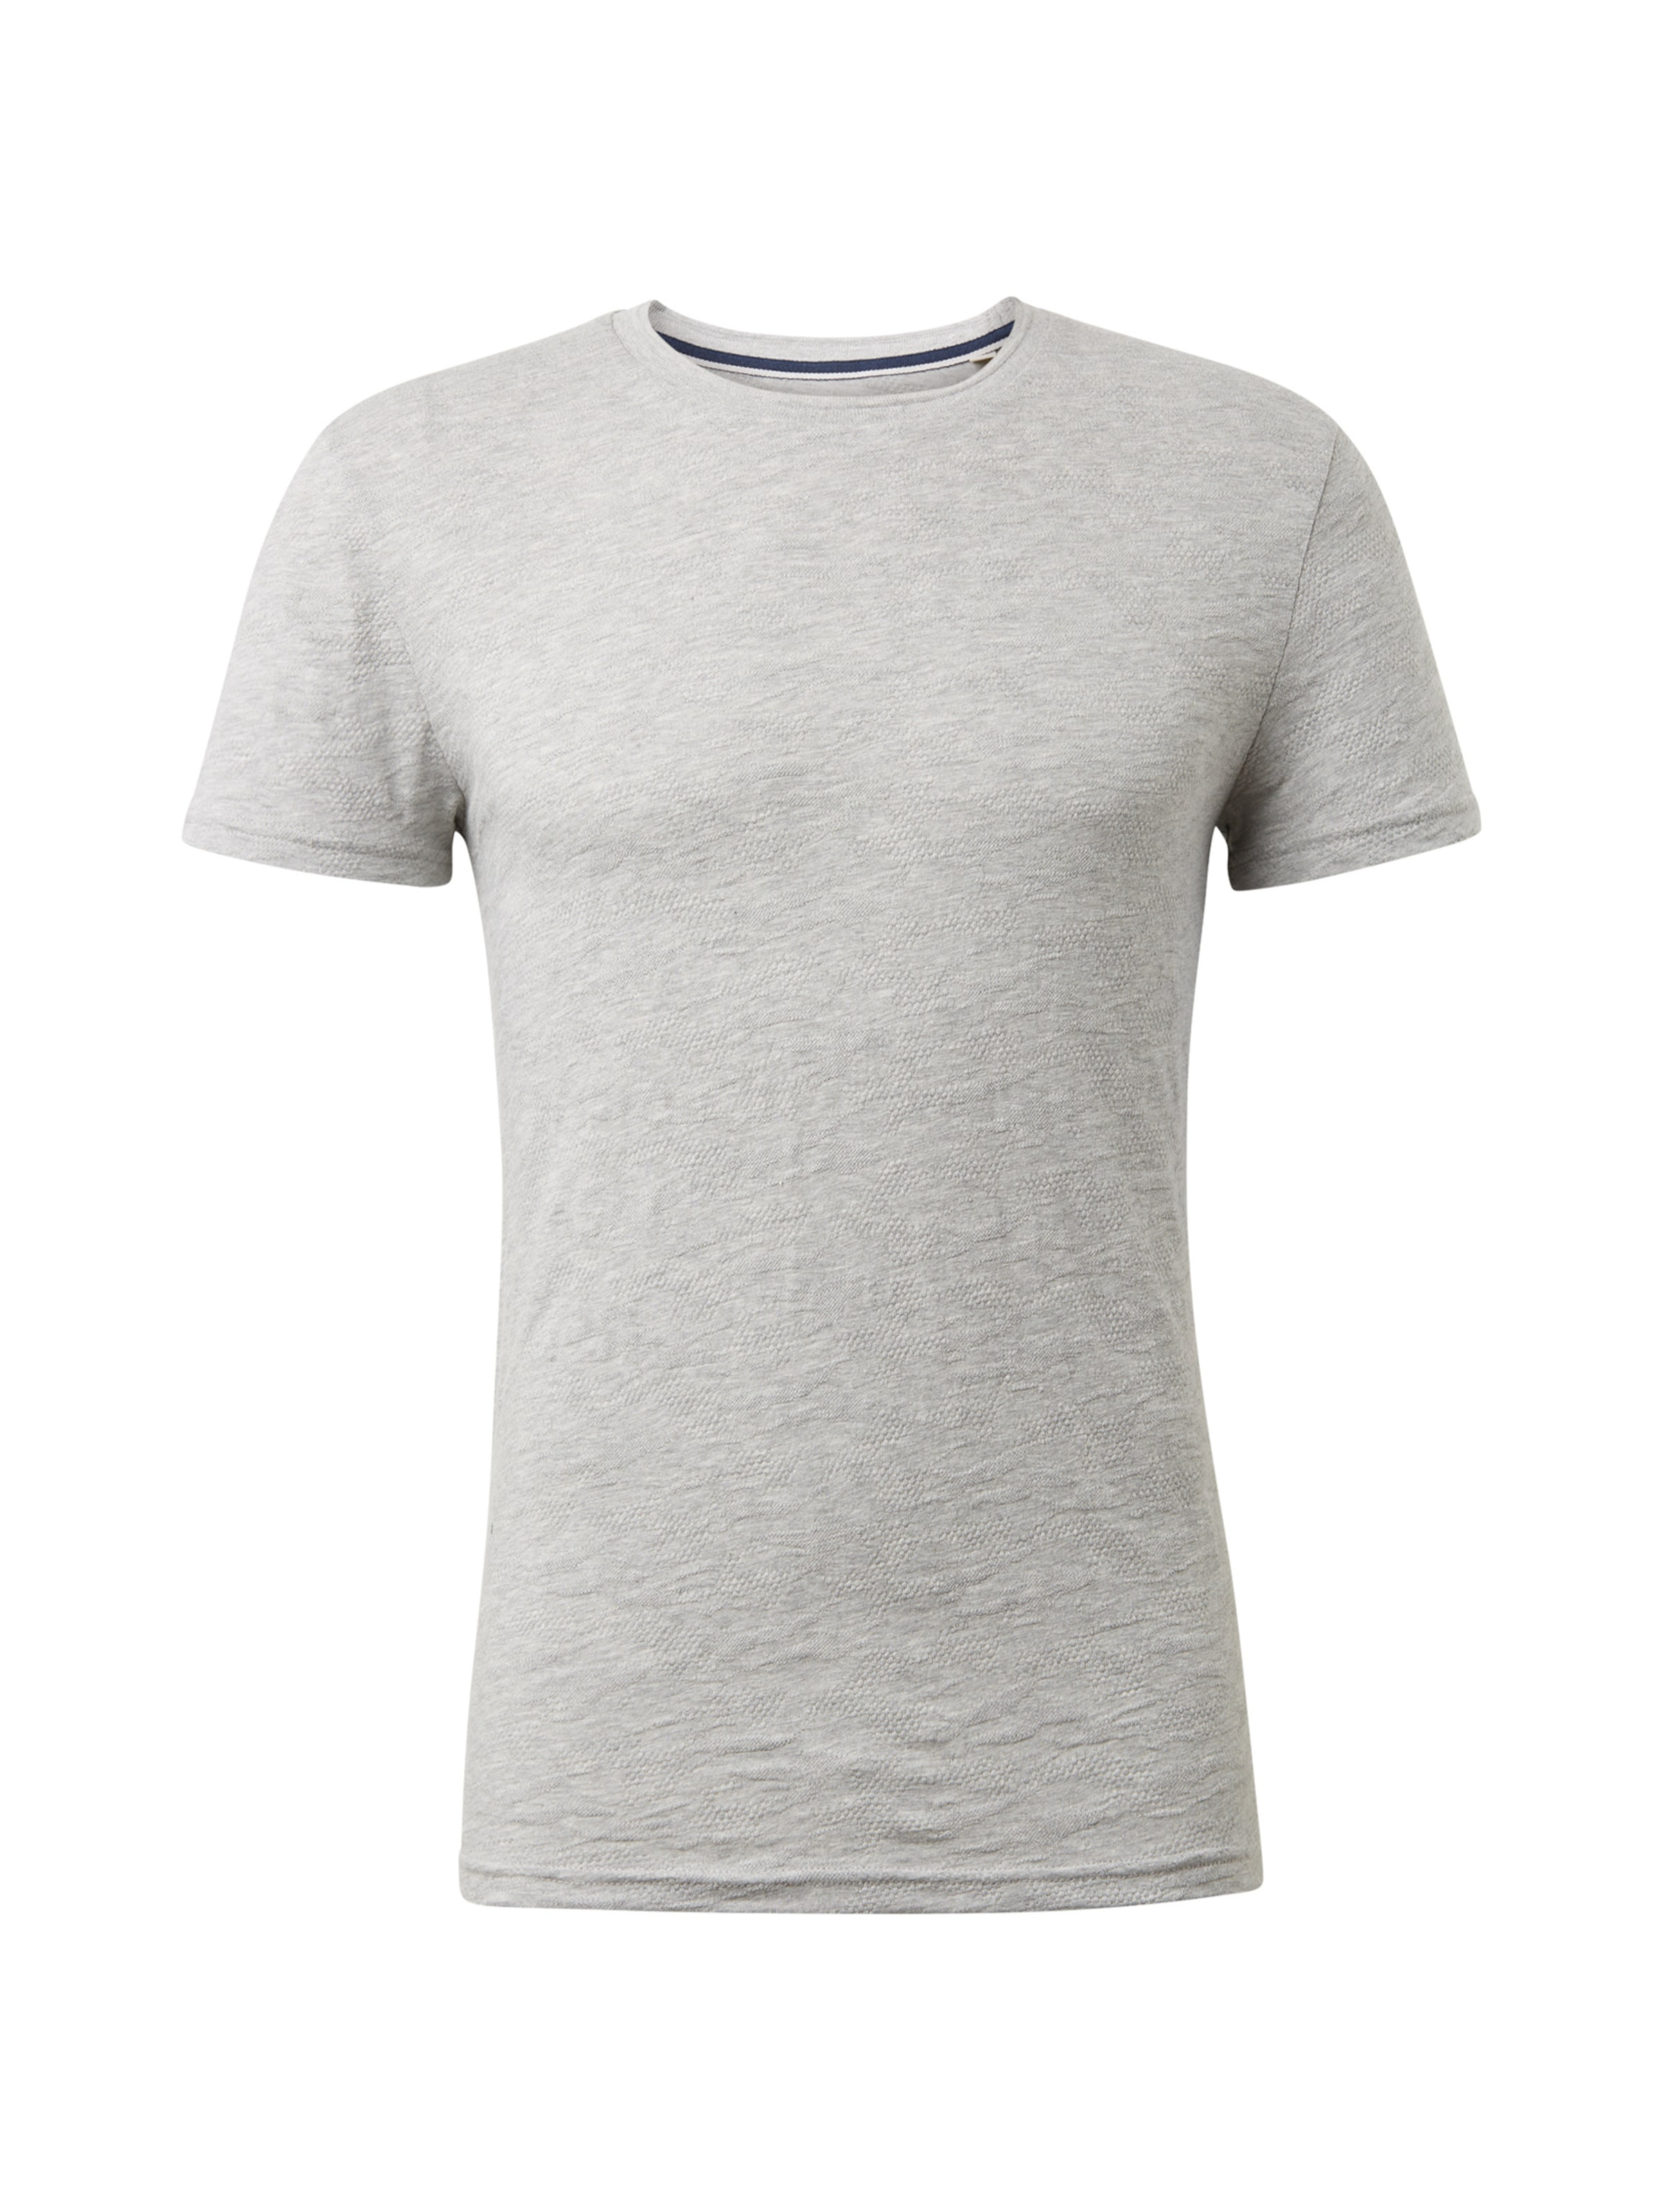 Grau T Tailor In shirt Tom 08nwXOPk